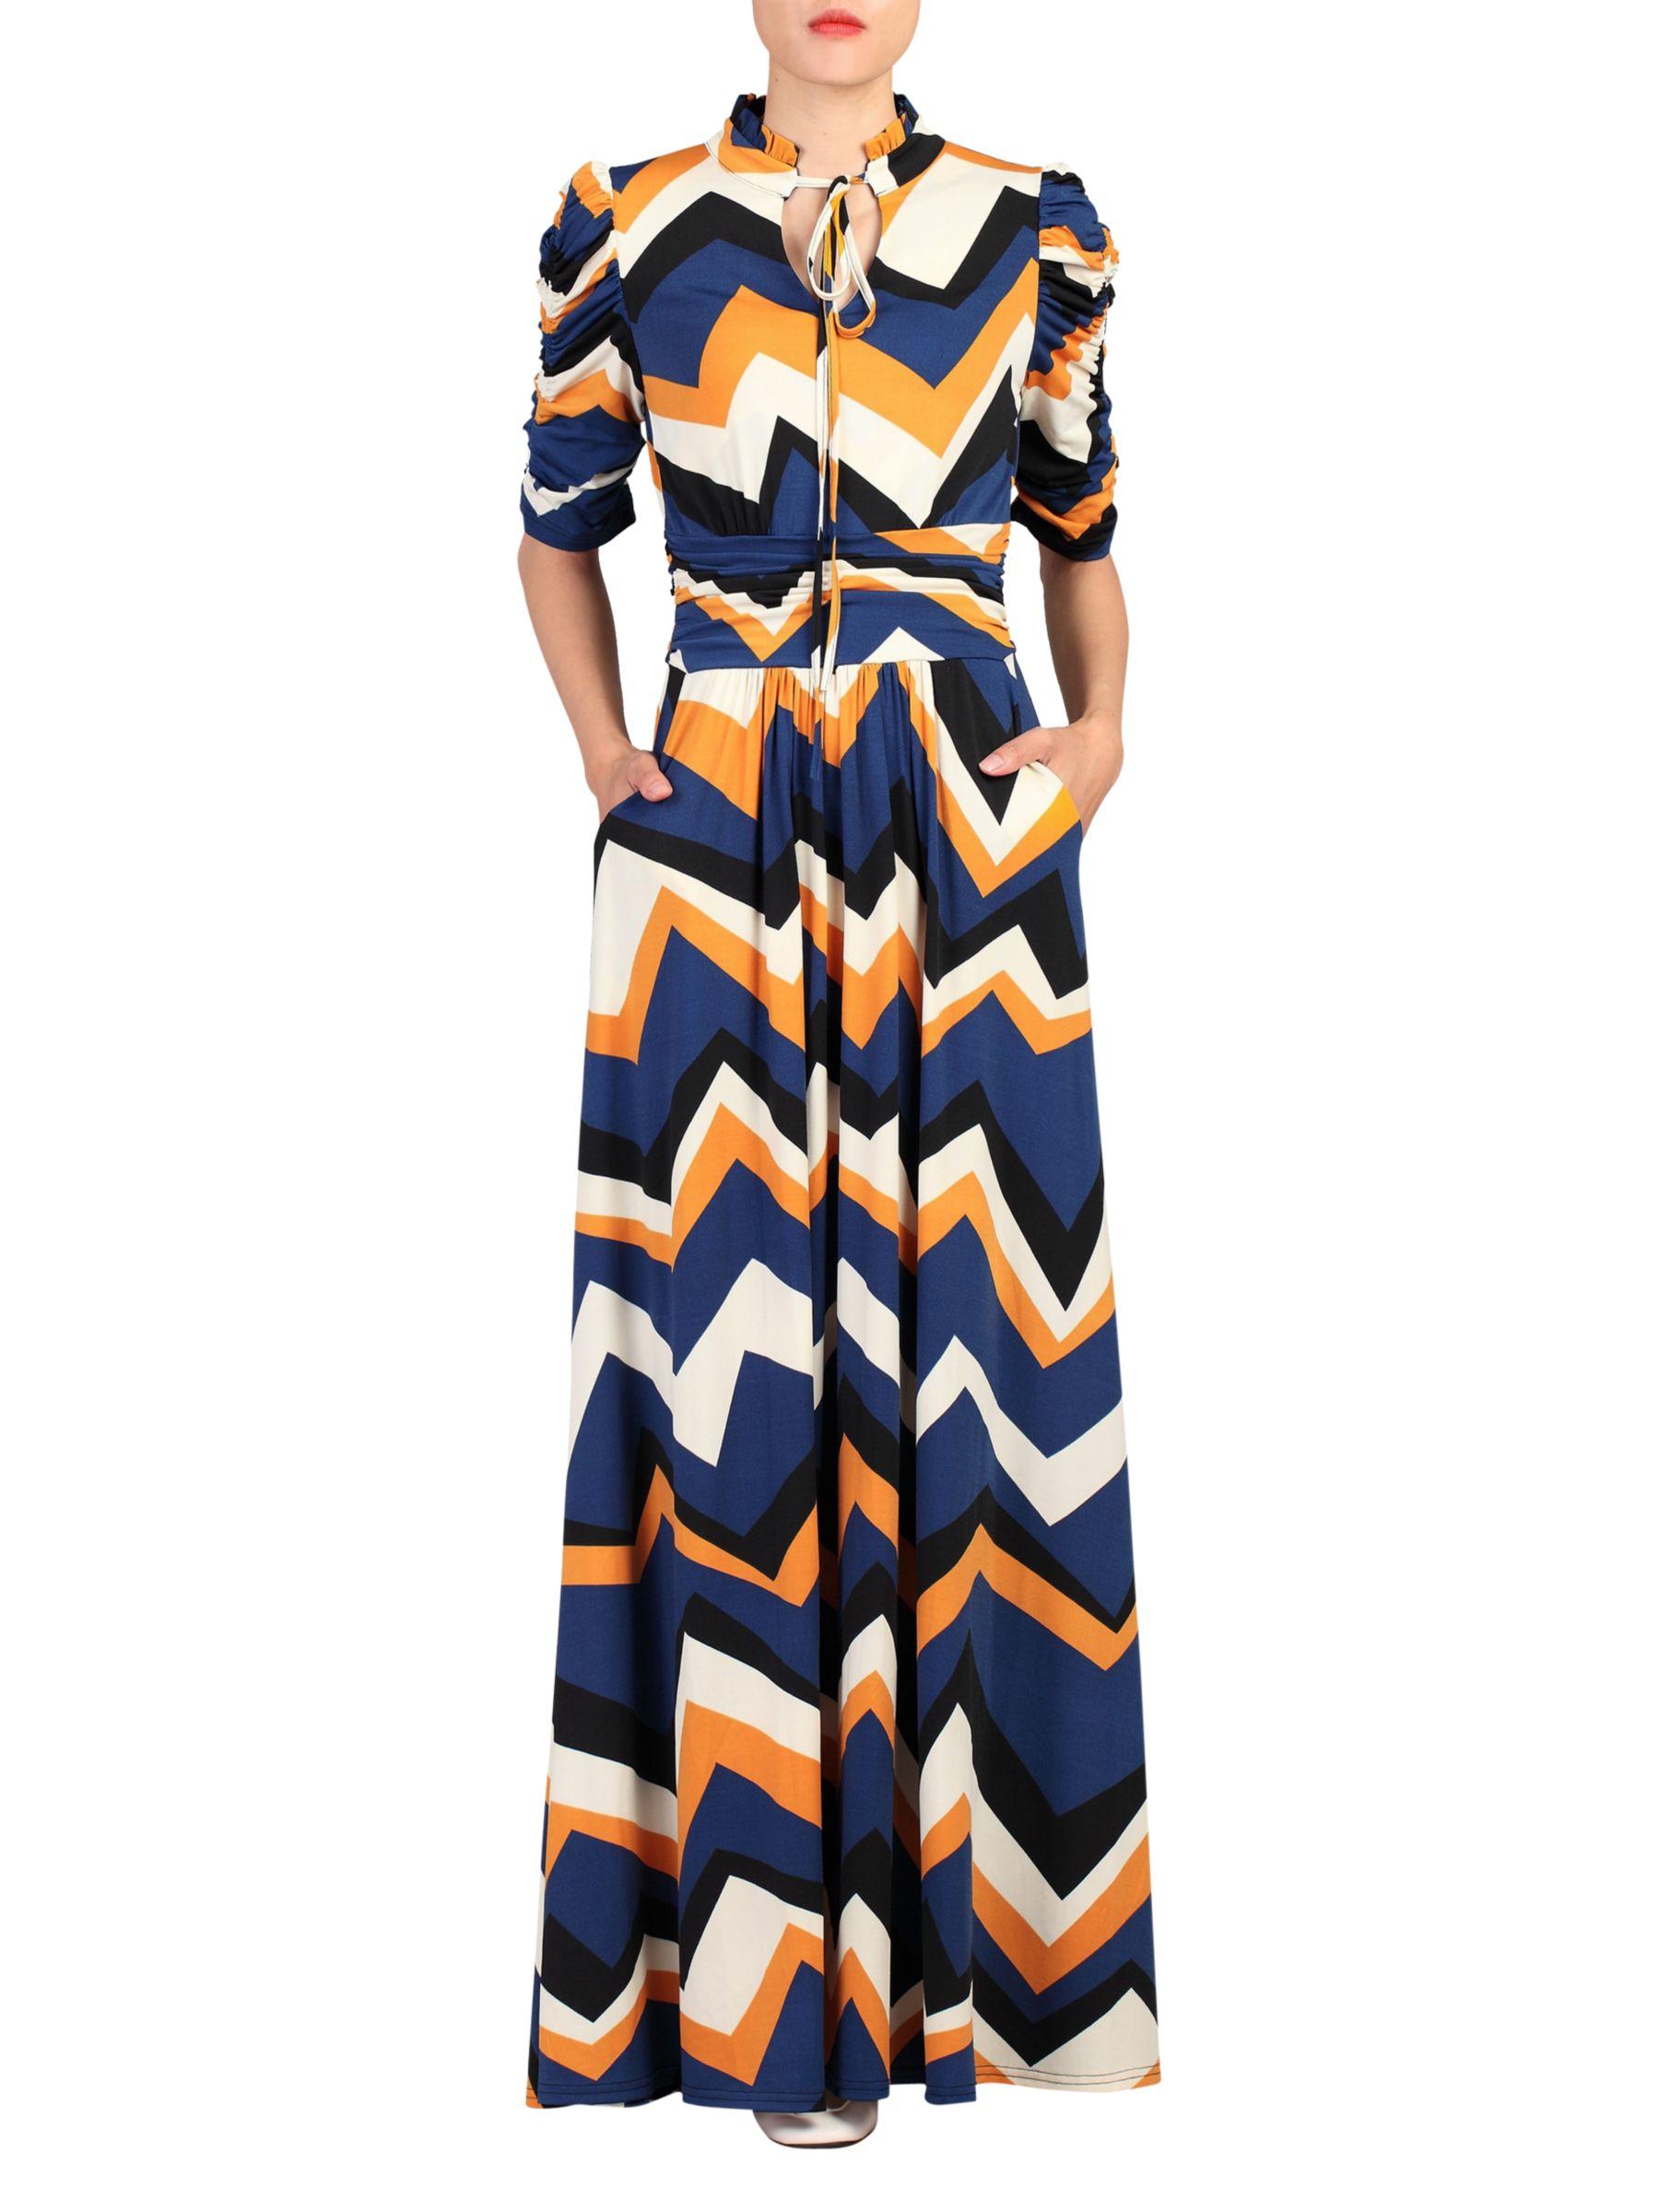 ab7fd245d6 Jolie Moi Chevron Print Tie Collar Maxi Dress, Multi at John Lewis &  Partners